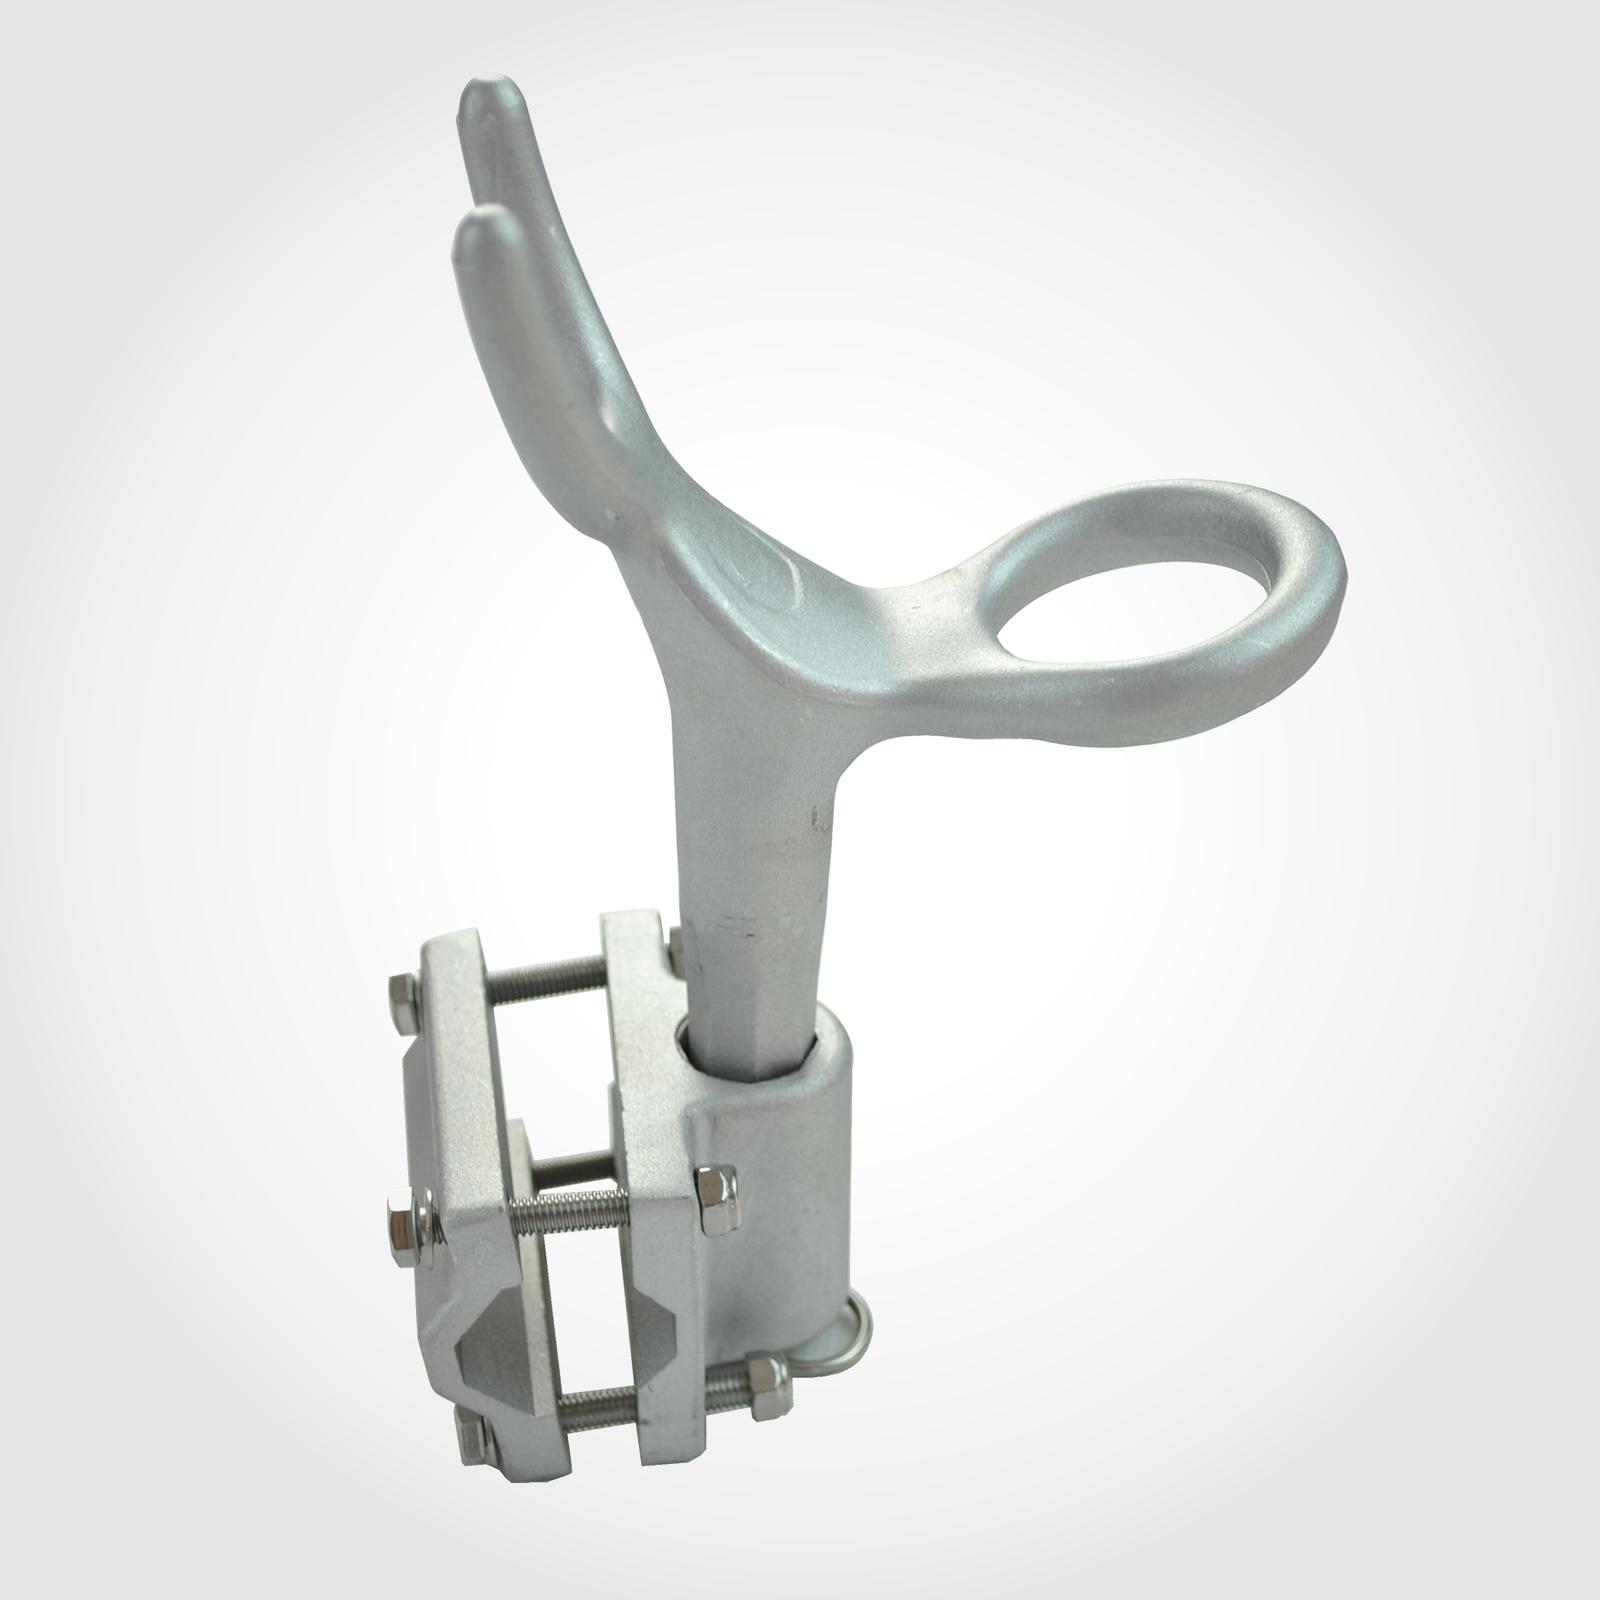 Alloy rod holder strong marine aluminium fishing with rail for Boat fishing rod holders